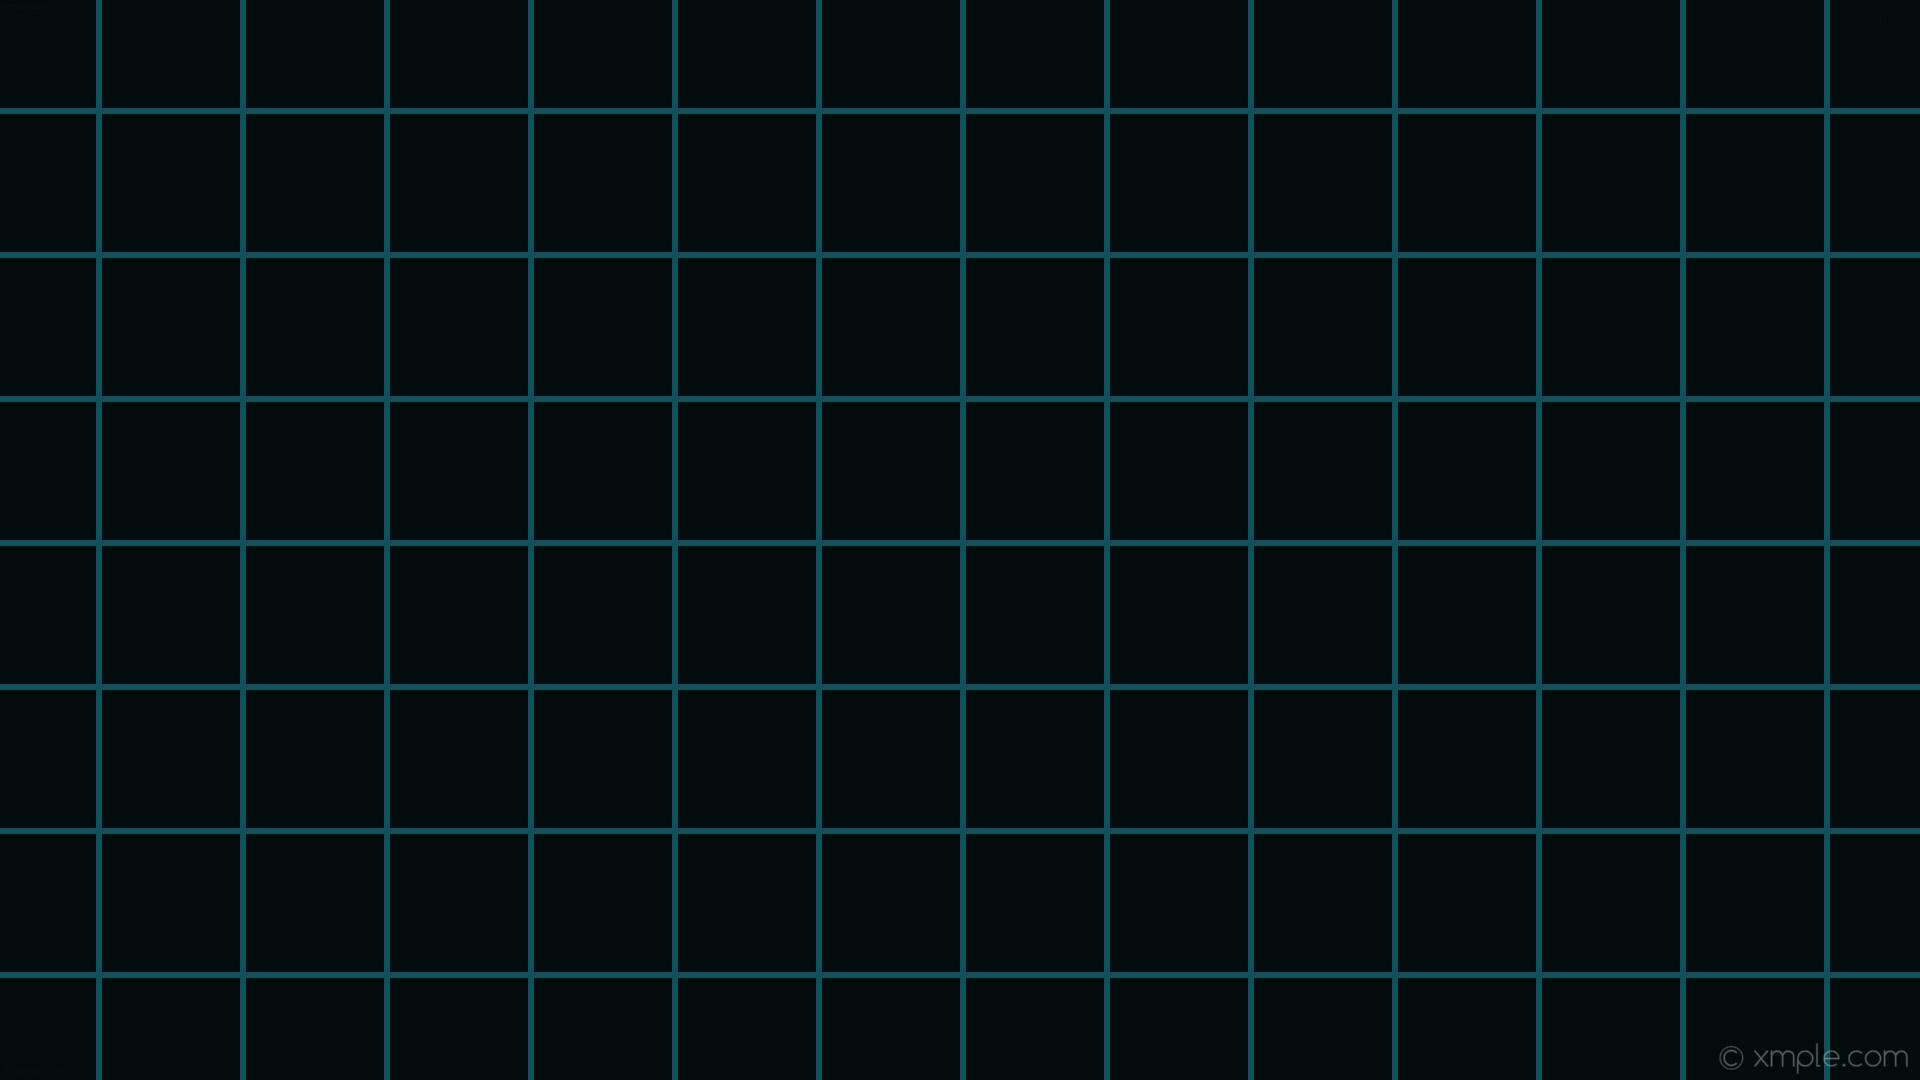 wallpaper graph paper grid cyan black #030c0d #126f7e 0° 6px 144px